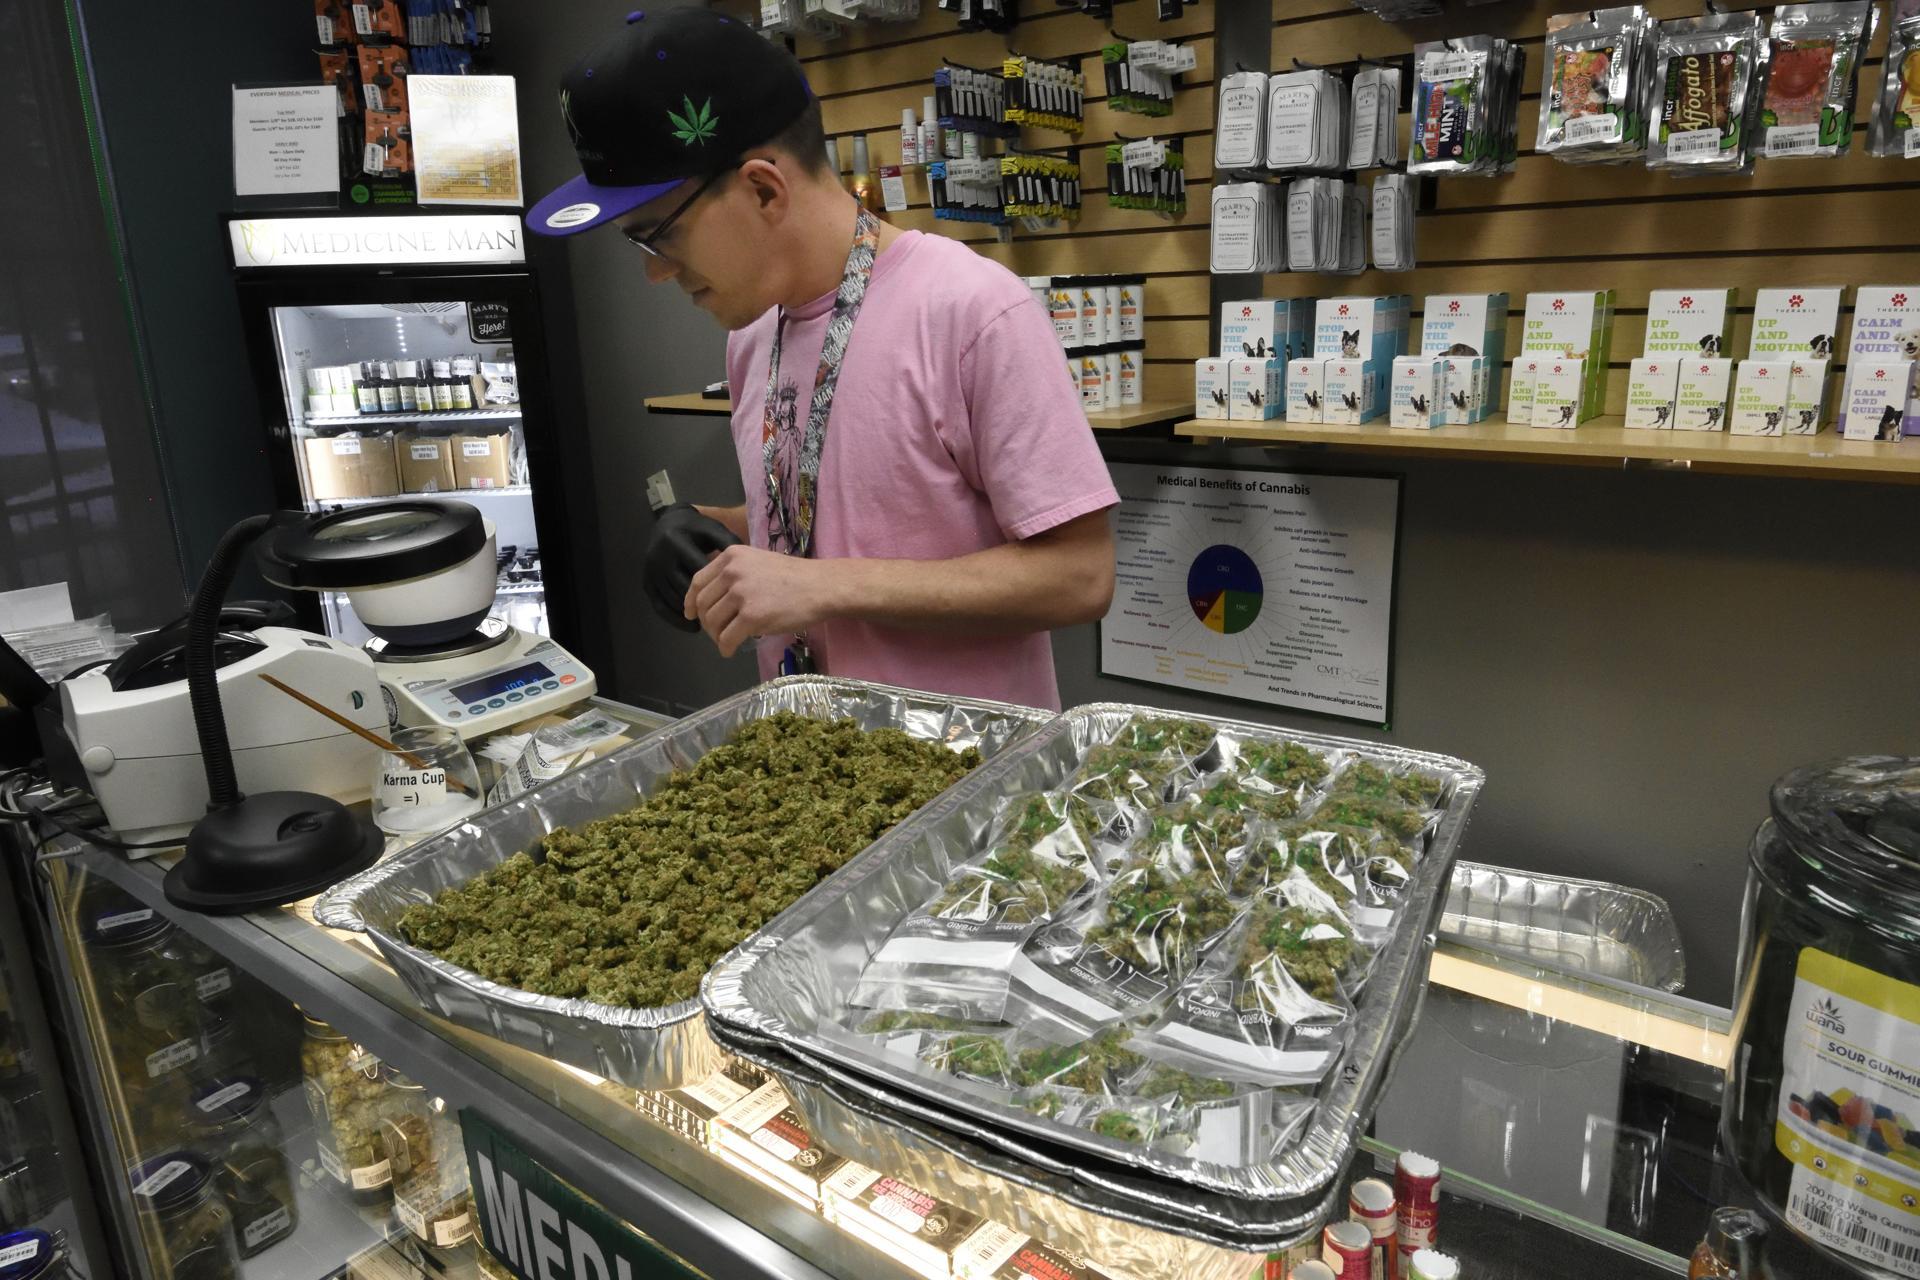 What is an appropriate way to write Marijuana in school?